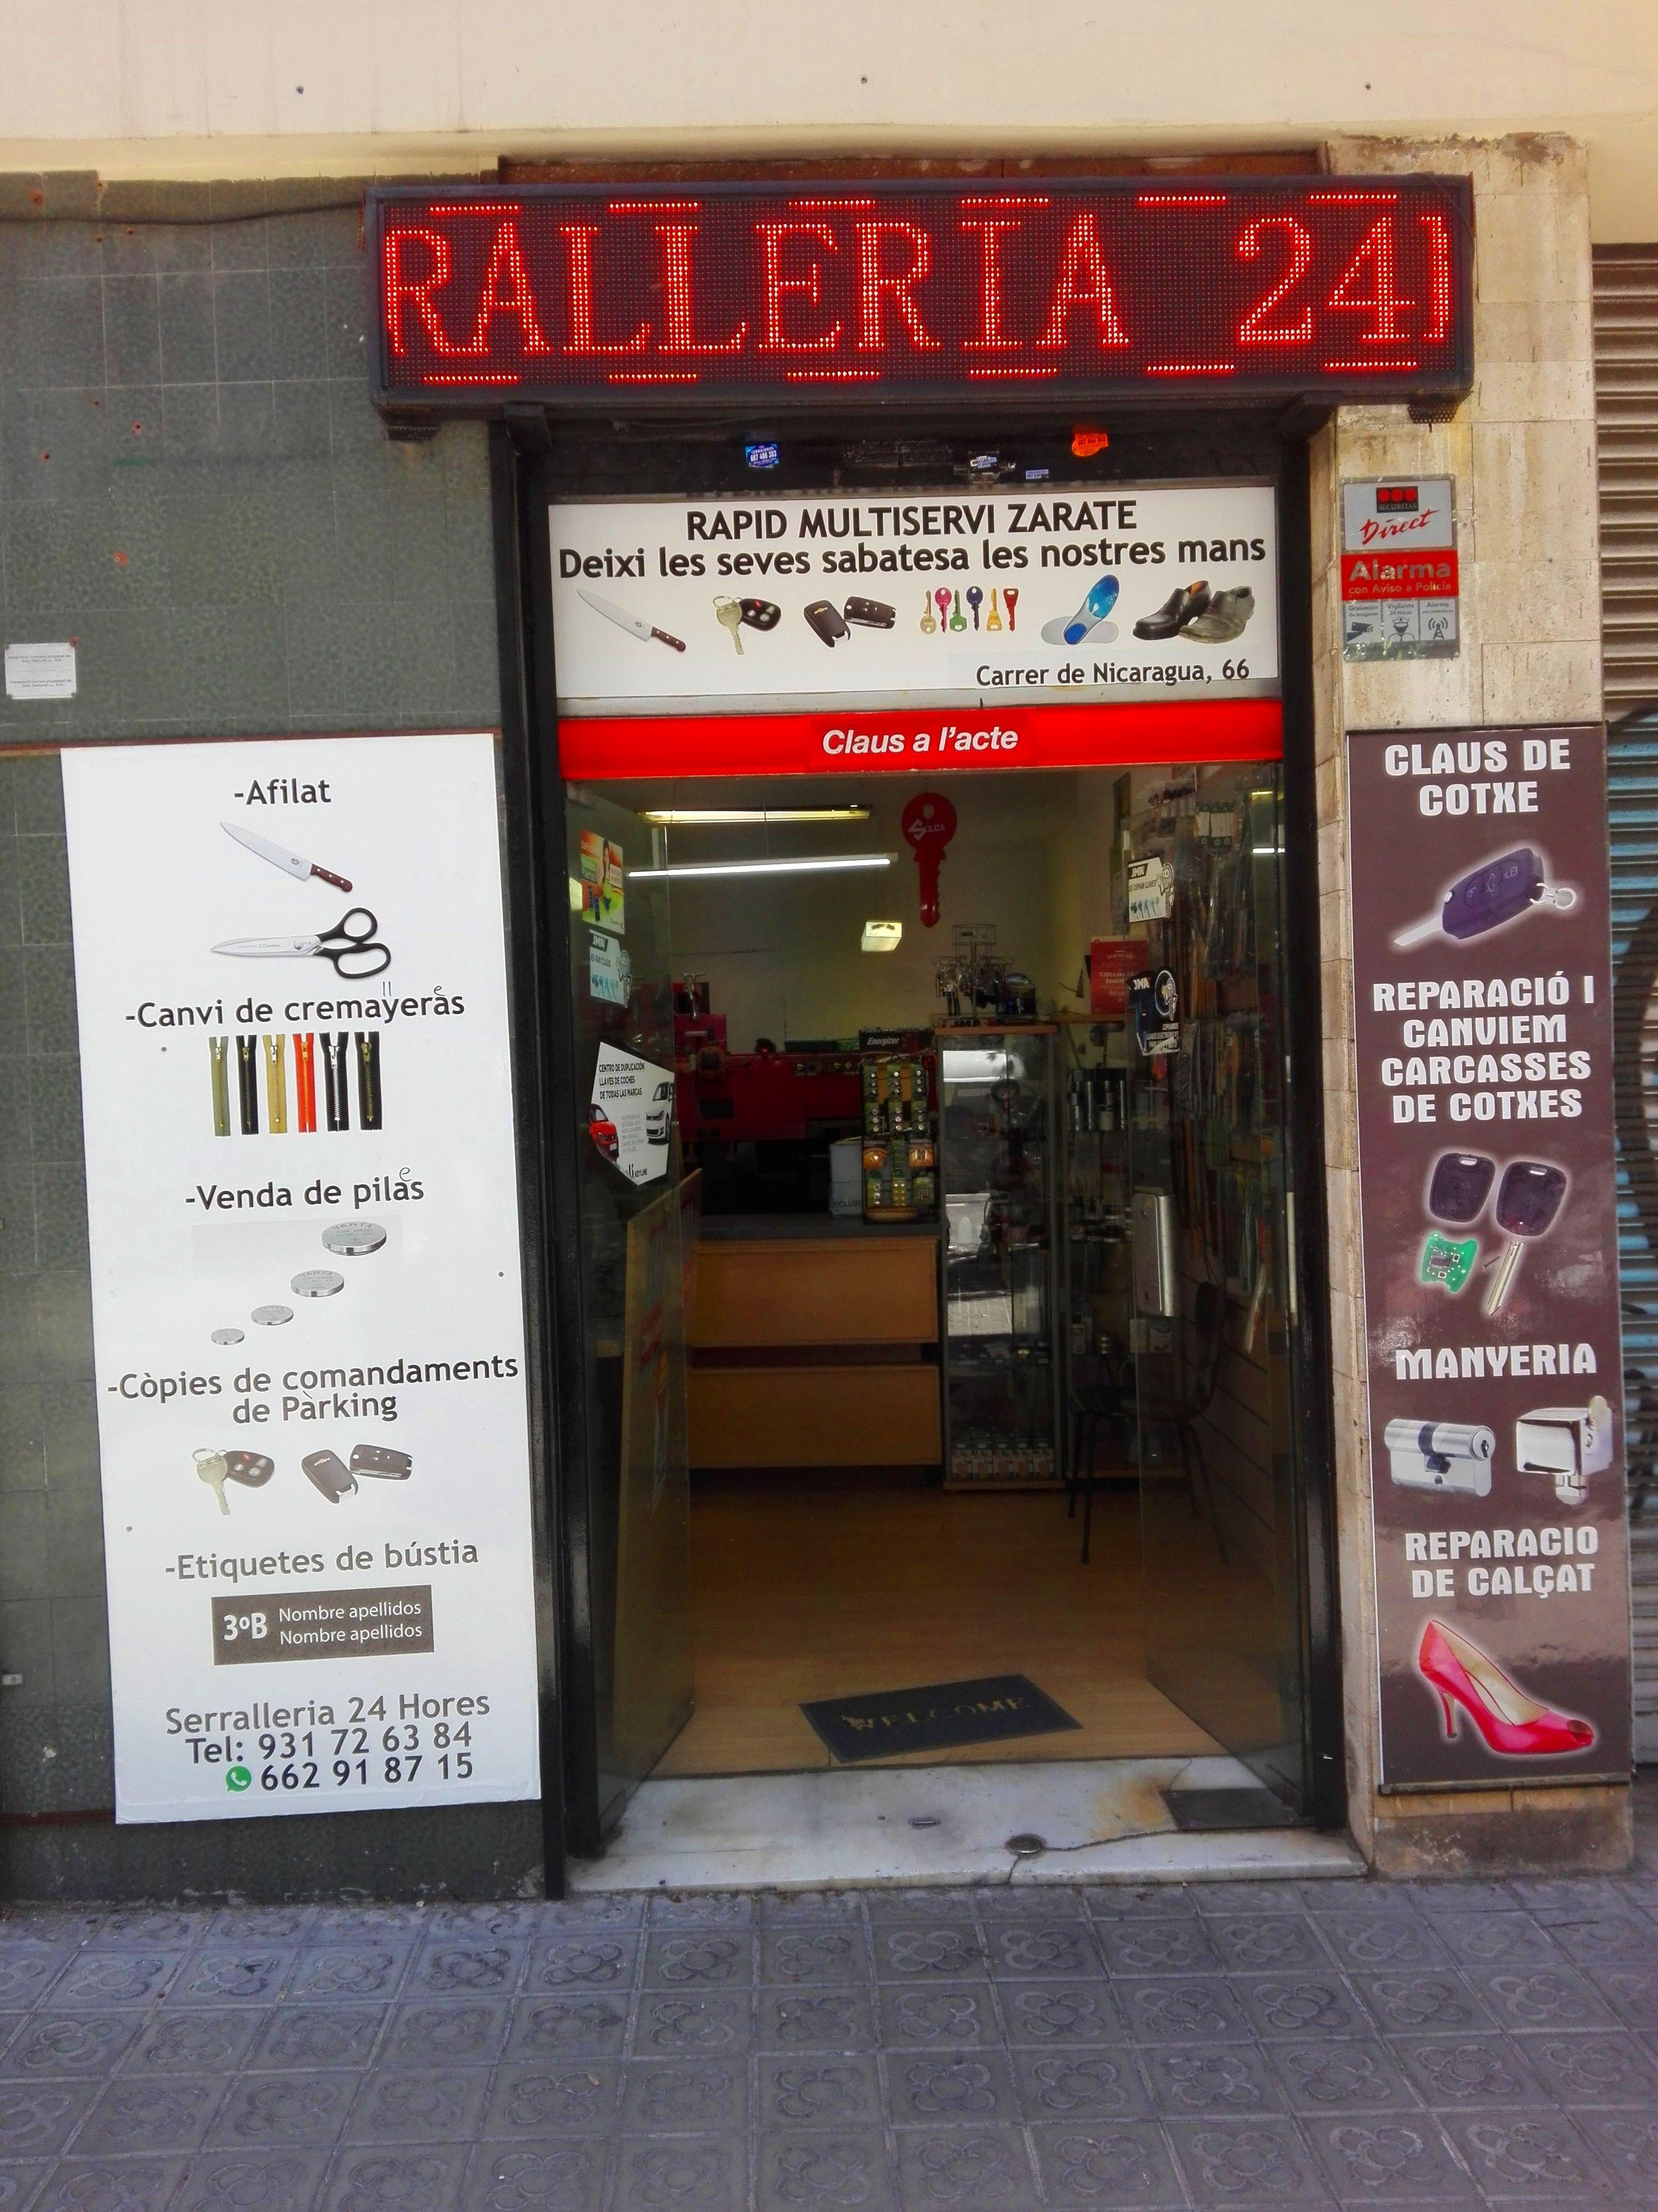 tienda de nicaragua 66